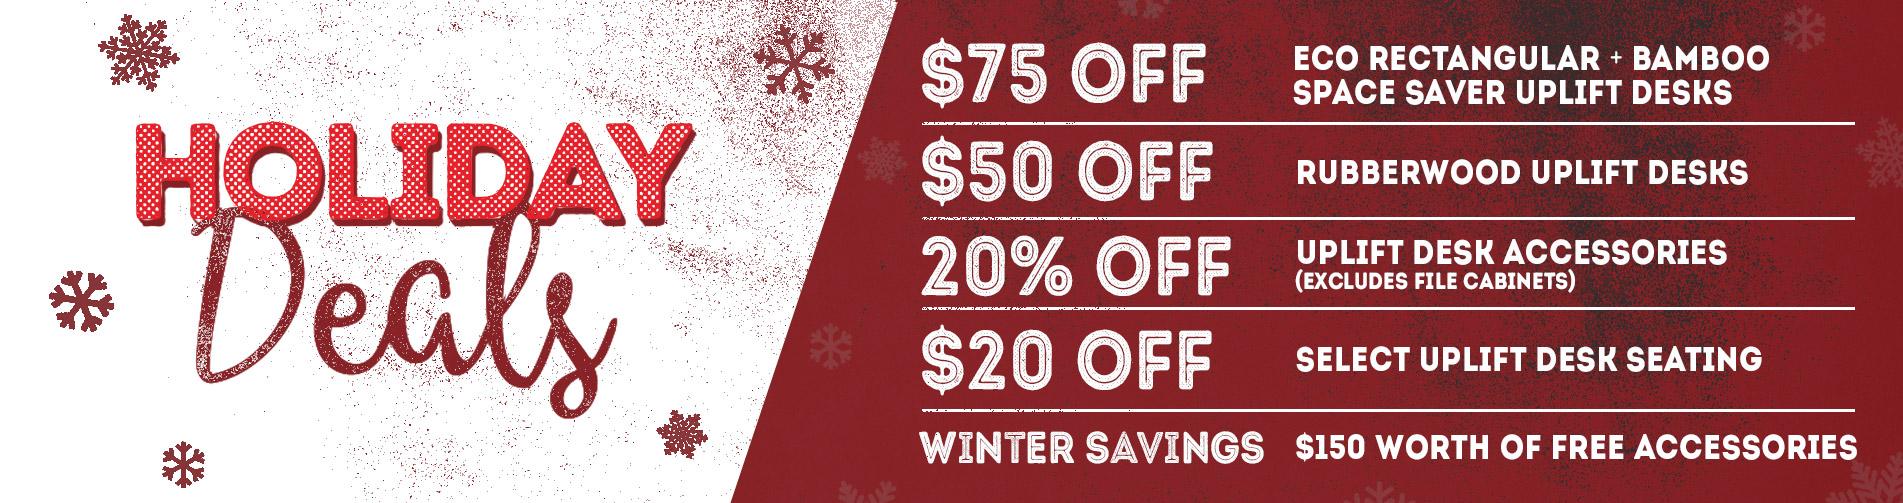 UPLIFT Desk Holiday Deals